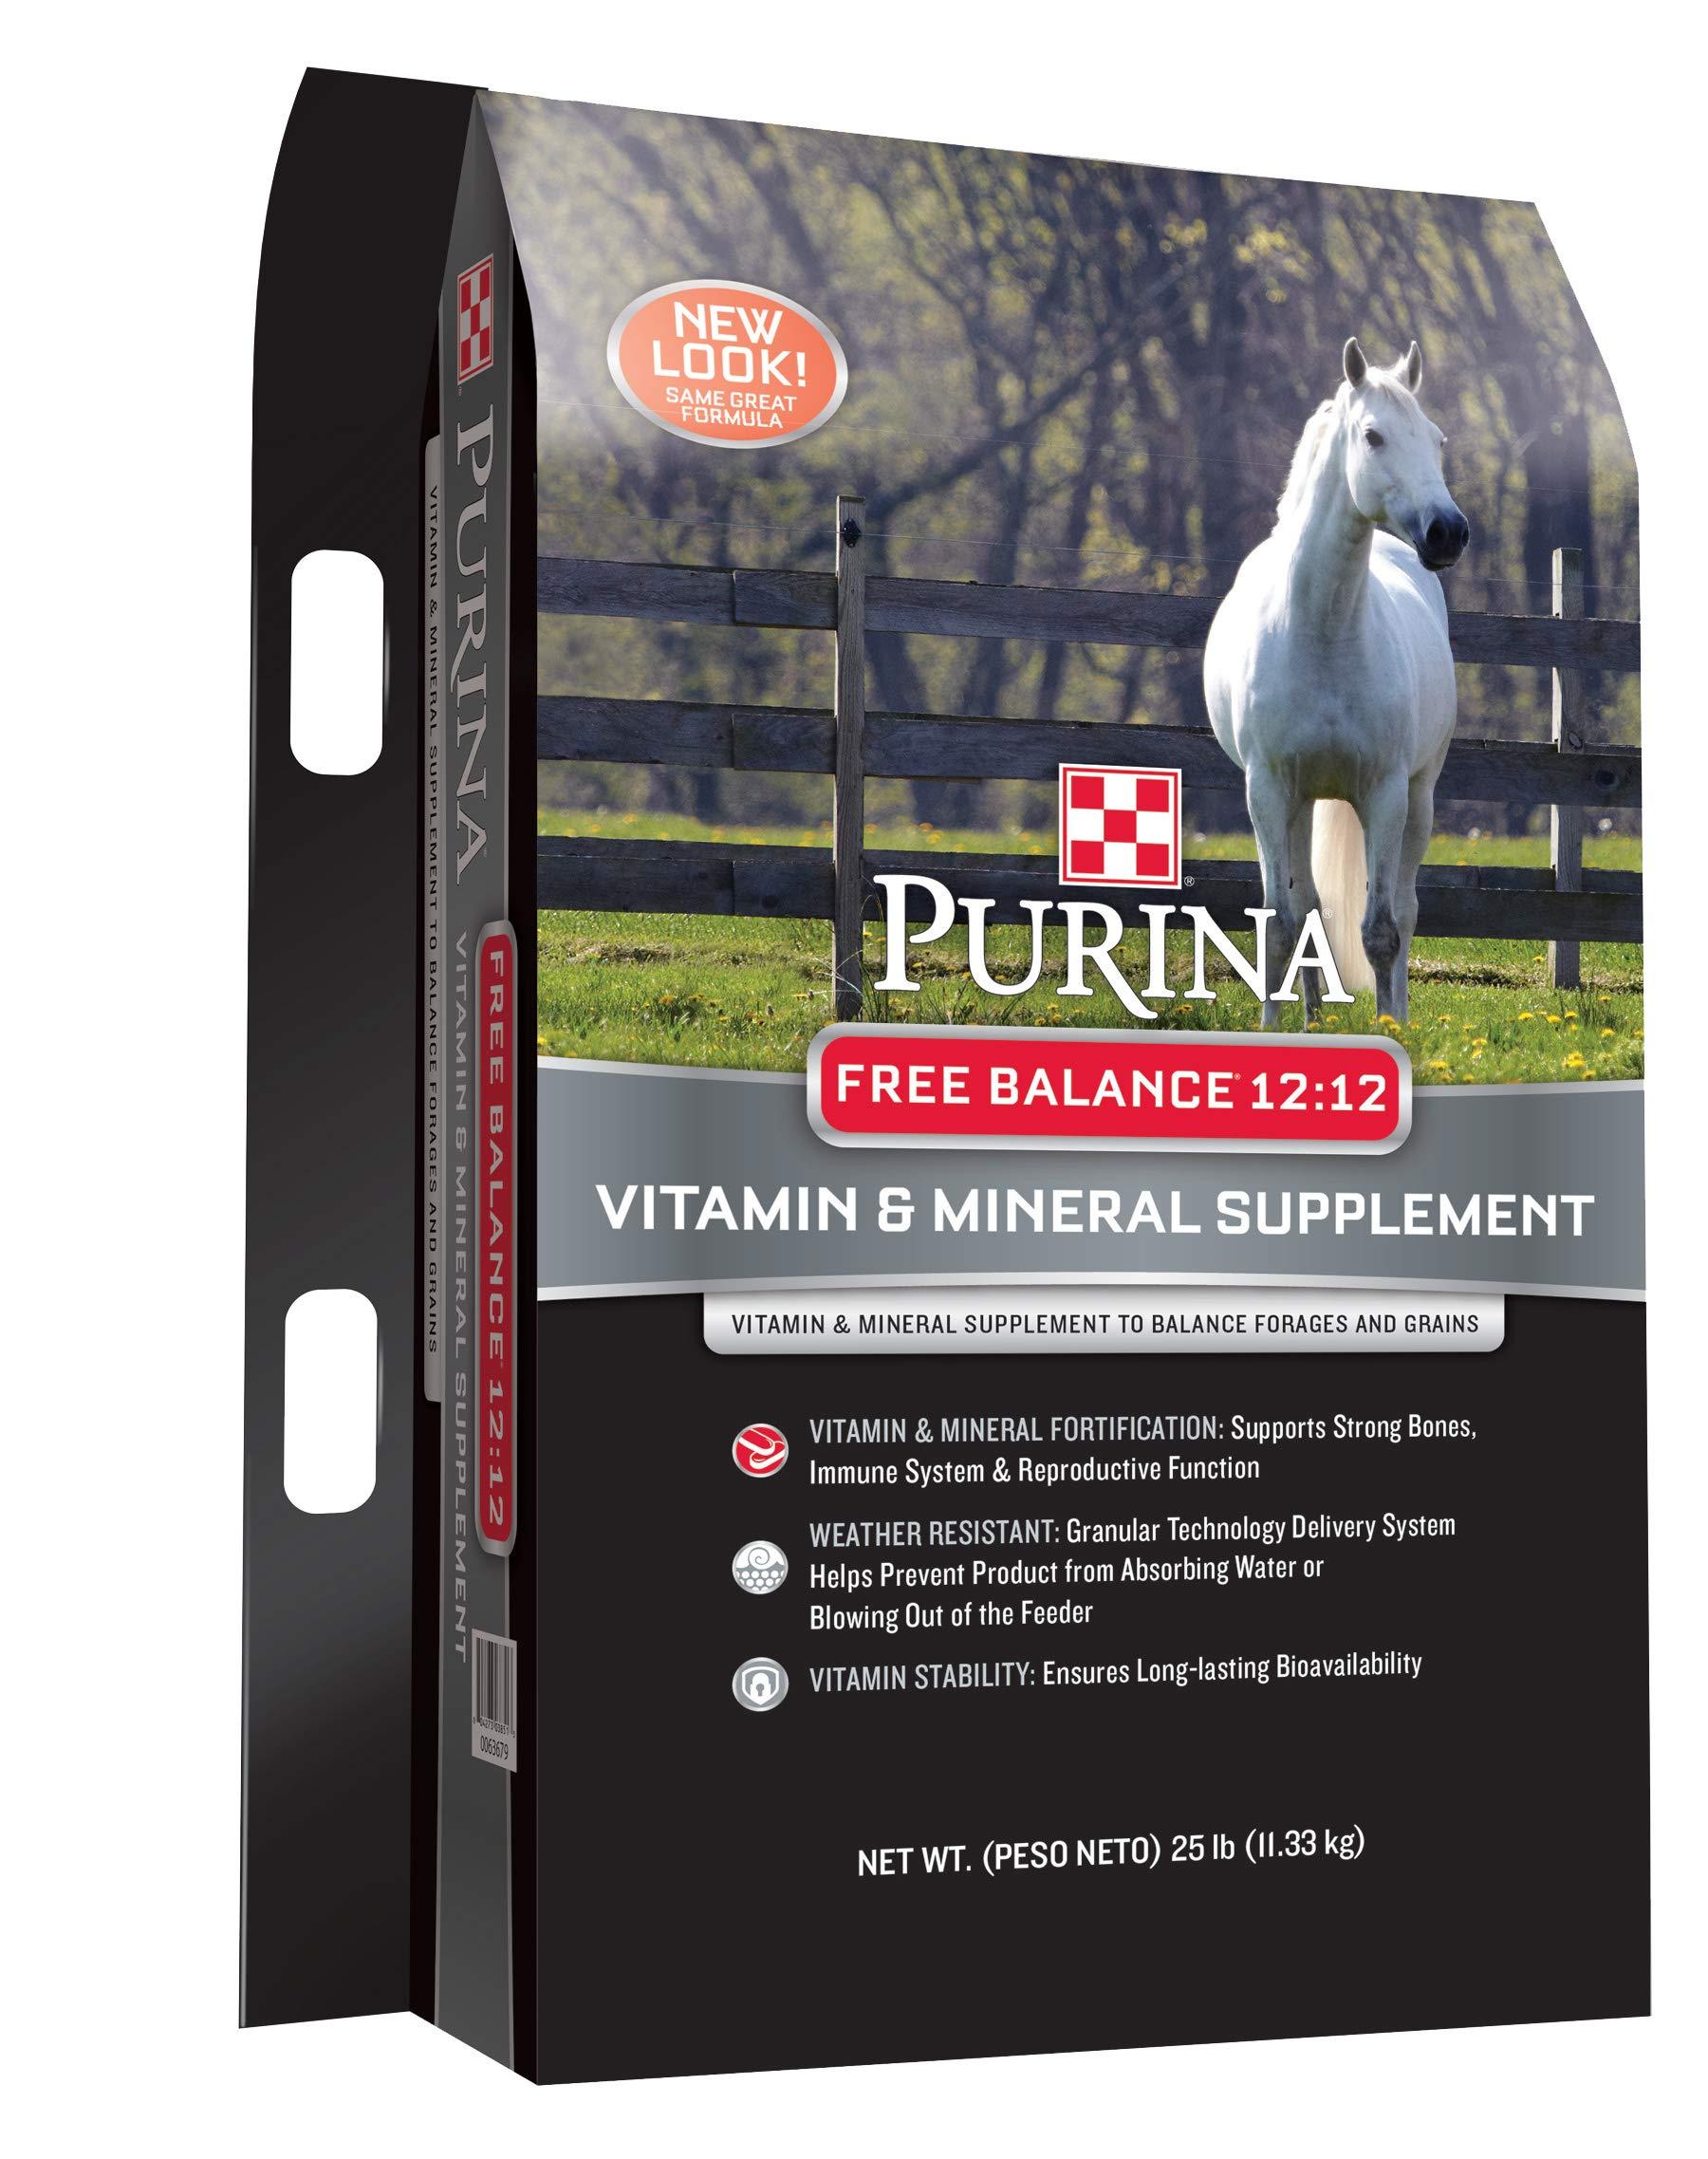 Purina Animal Nutrition Purina Free Balance 12 12 Horse Supplement 25lbs